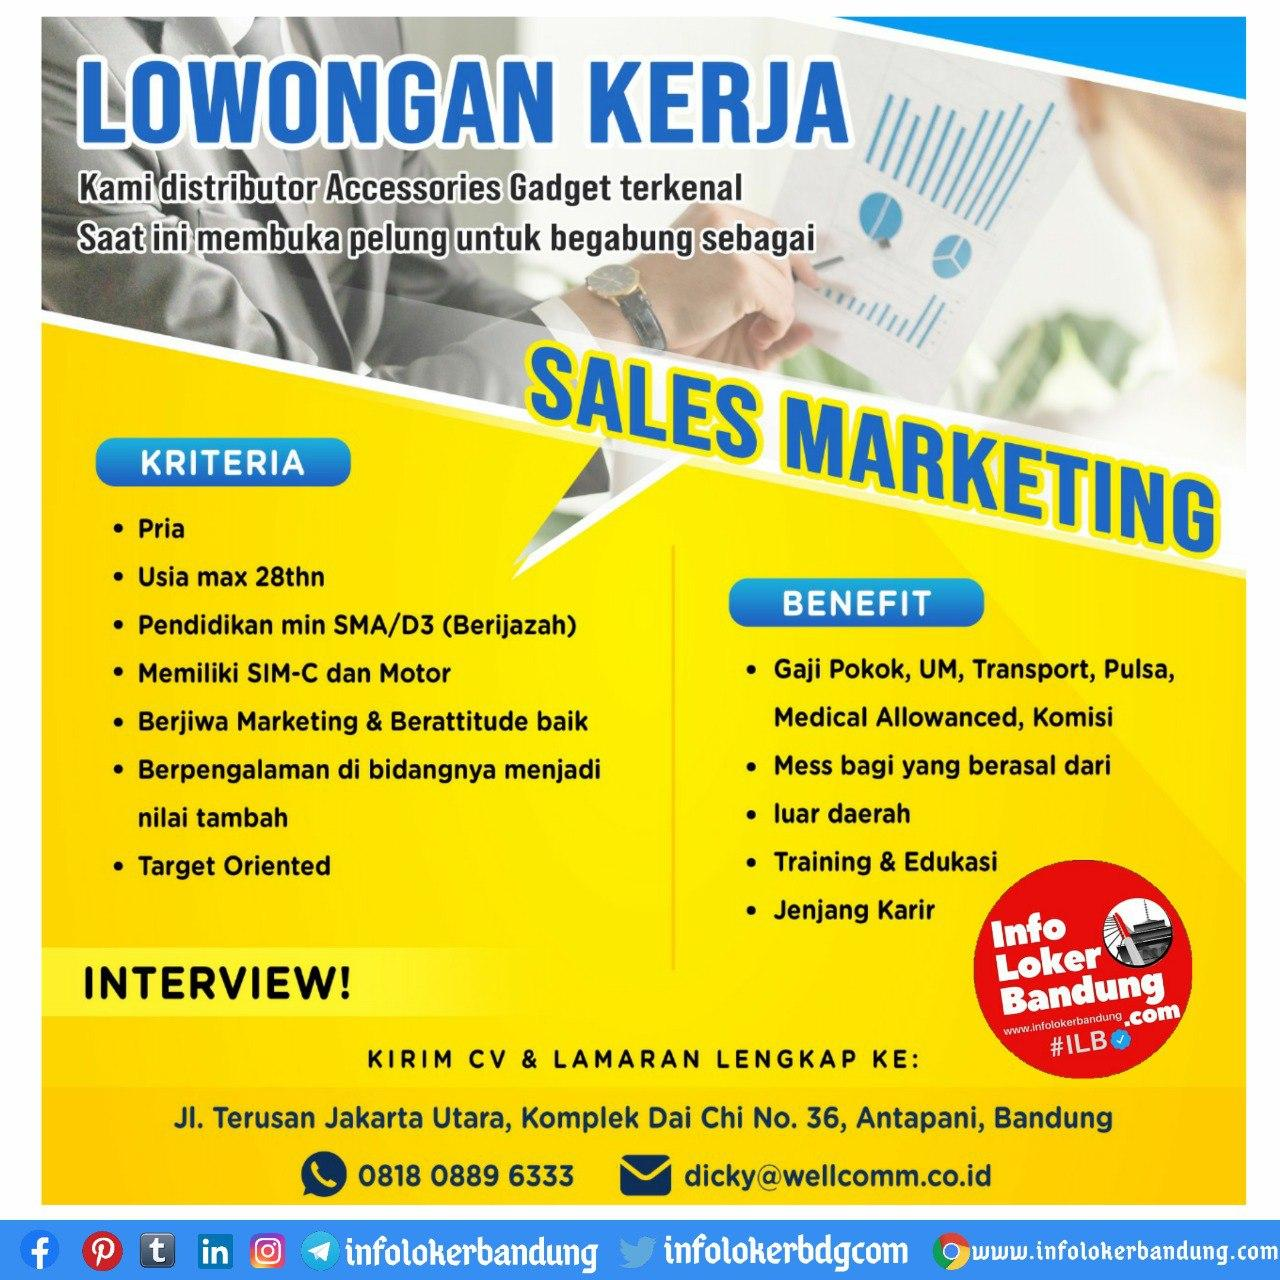 Lowongan Kerja Sales Marketing CV. Bandung Indo Pratama ( Wellcomm ) September 2020